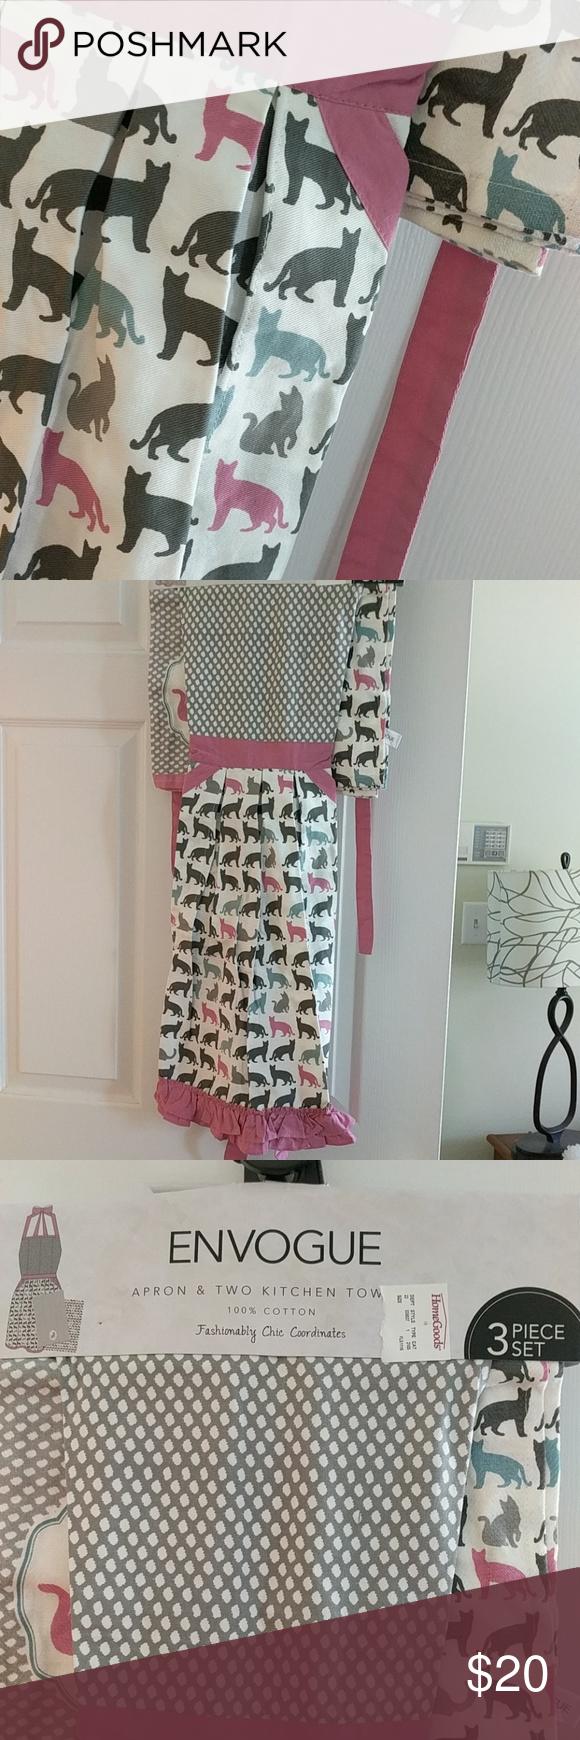 Kitty apron and kitchen towel set nwt my posh picks pinterest